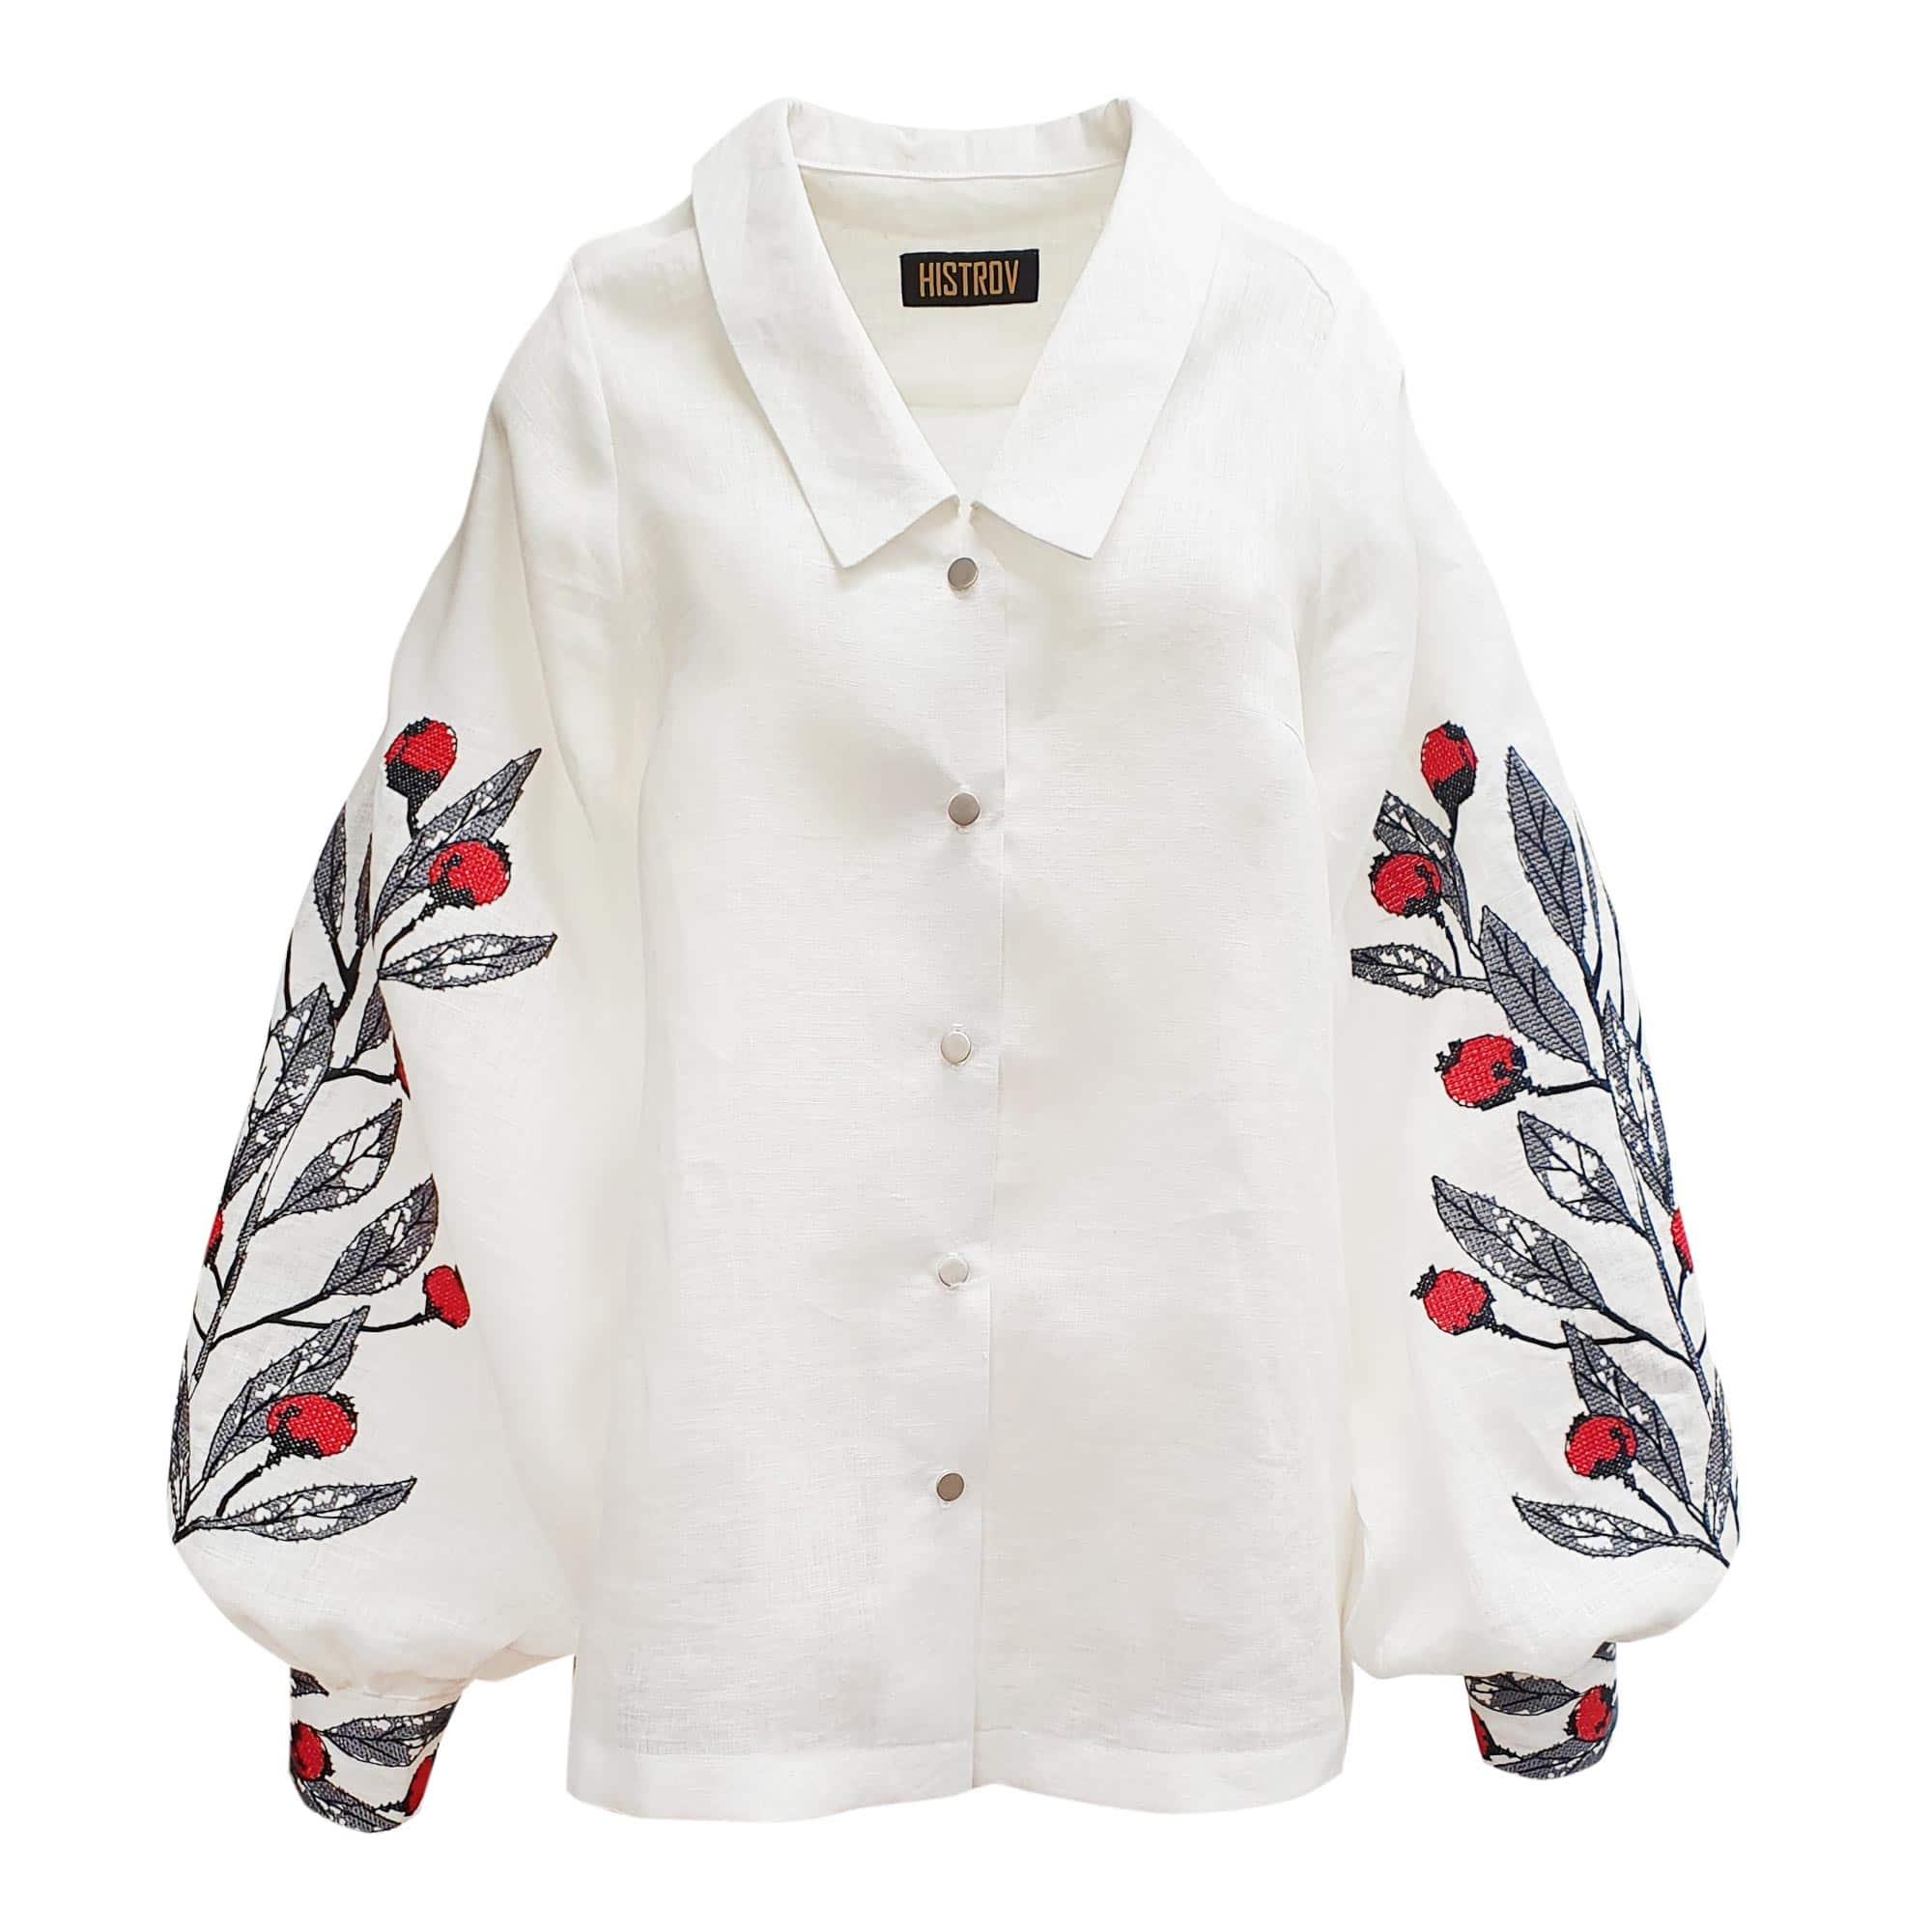 Elite embroidered shirt